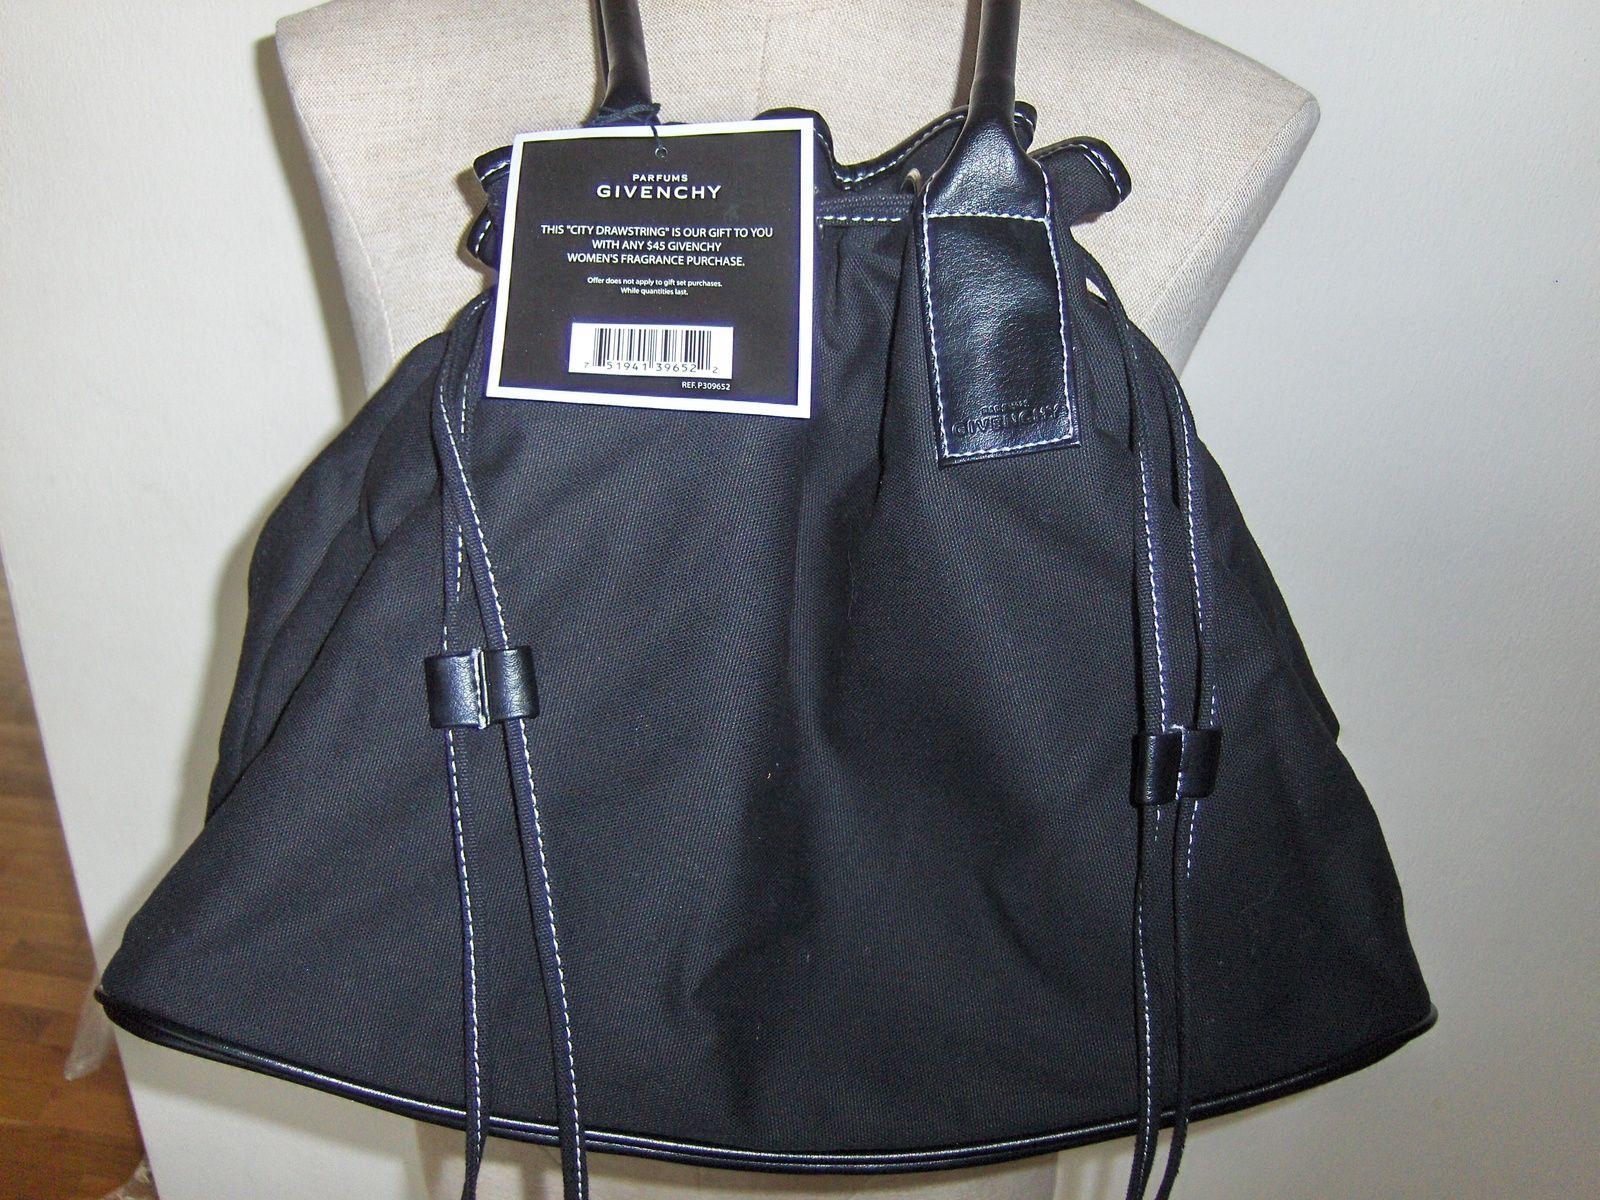 7d39daaf1c52 Givenchy Parfums City Drawstring Black Purse Handbag Tote Bag Shopper Travel